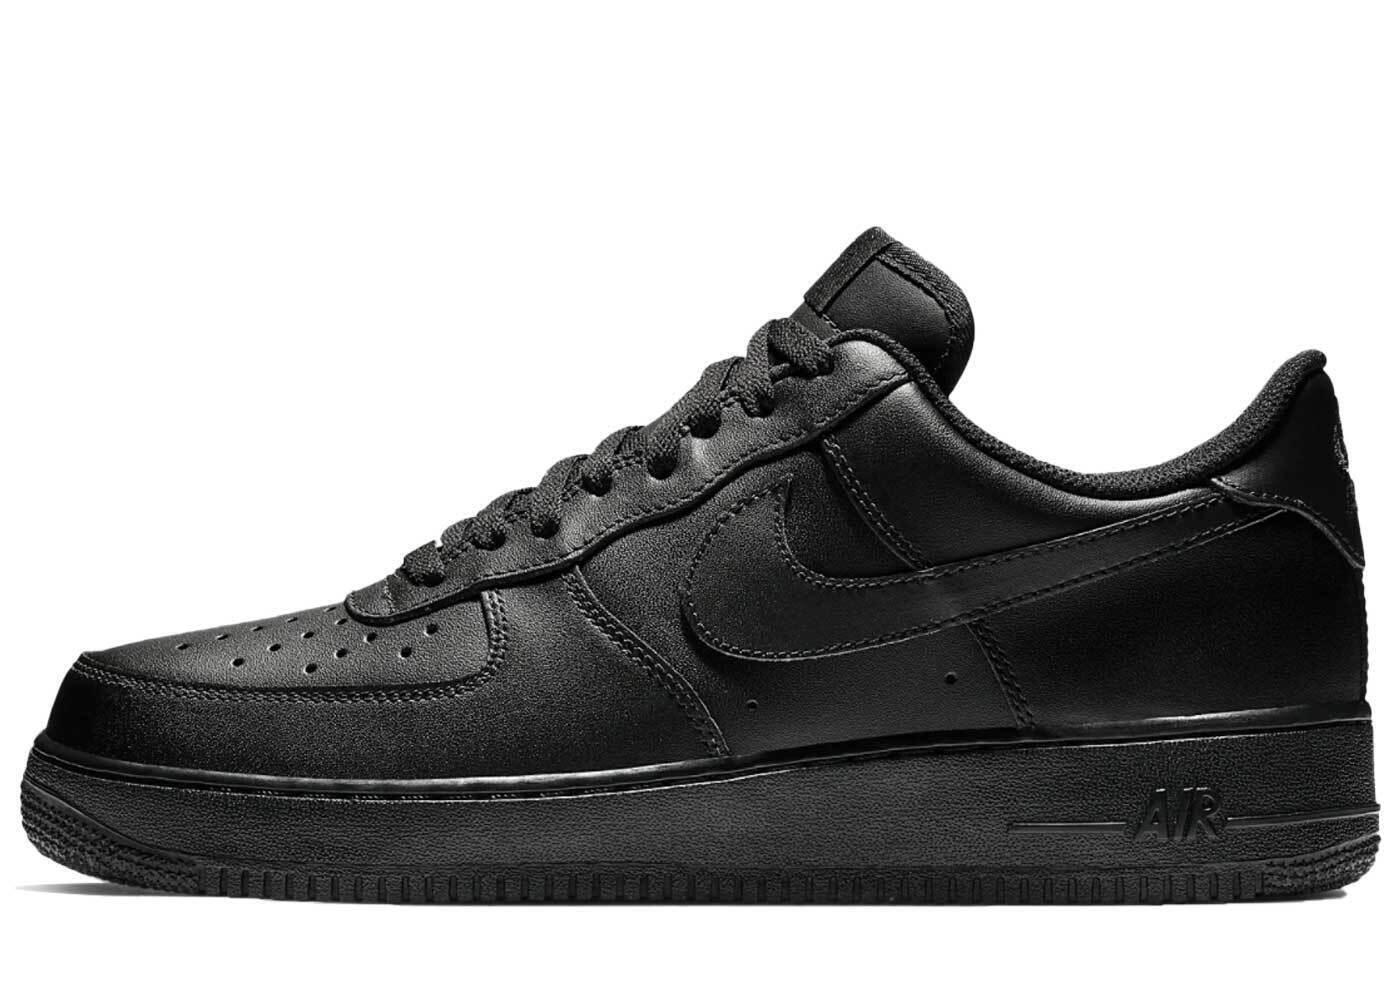 Nike Air Force 1 Low 07 Black (CW2288-001)の写真